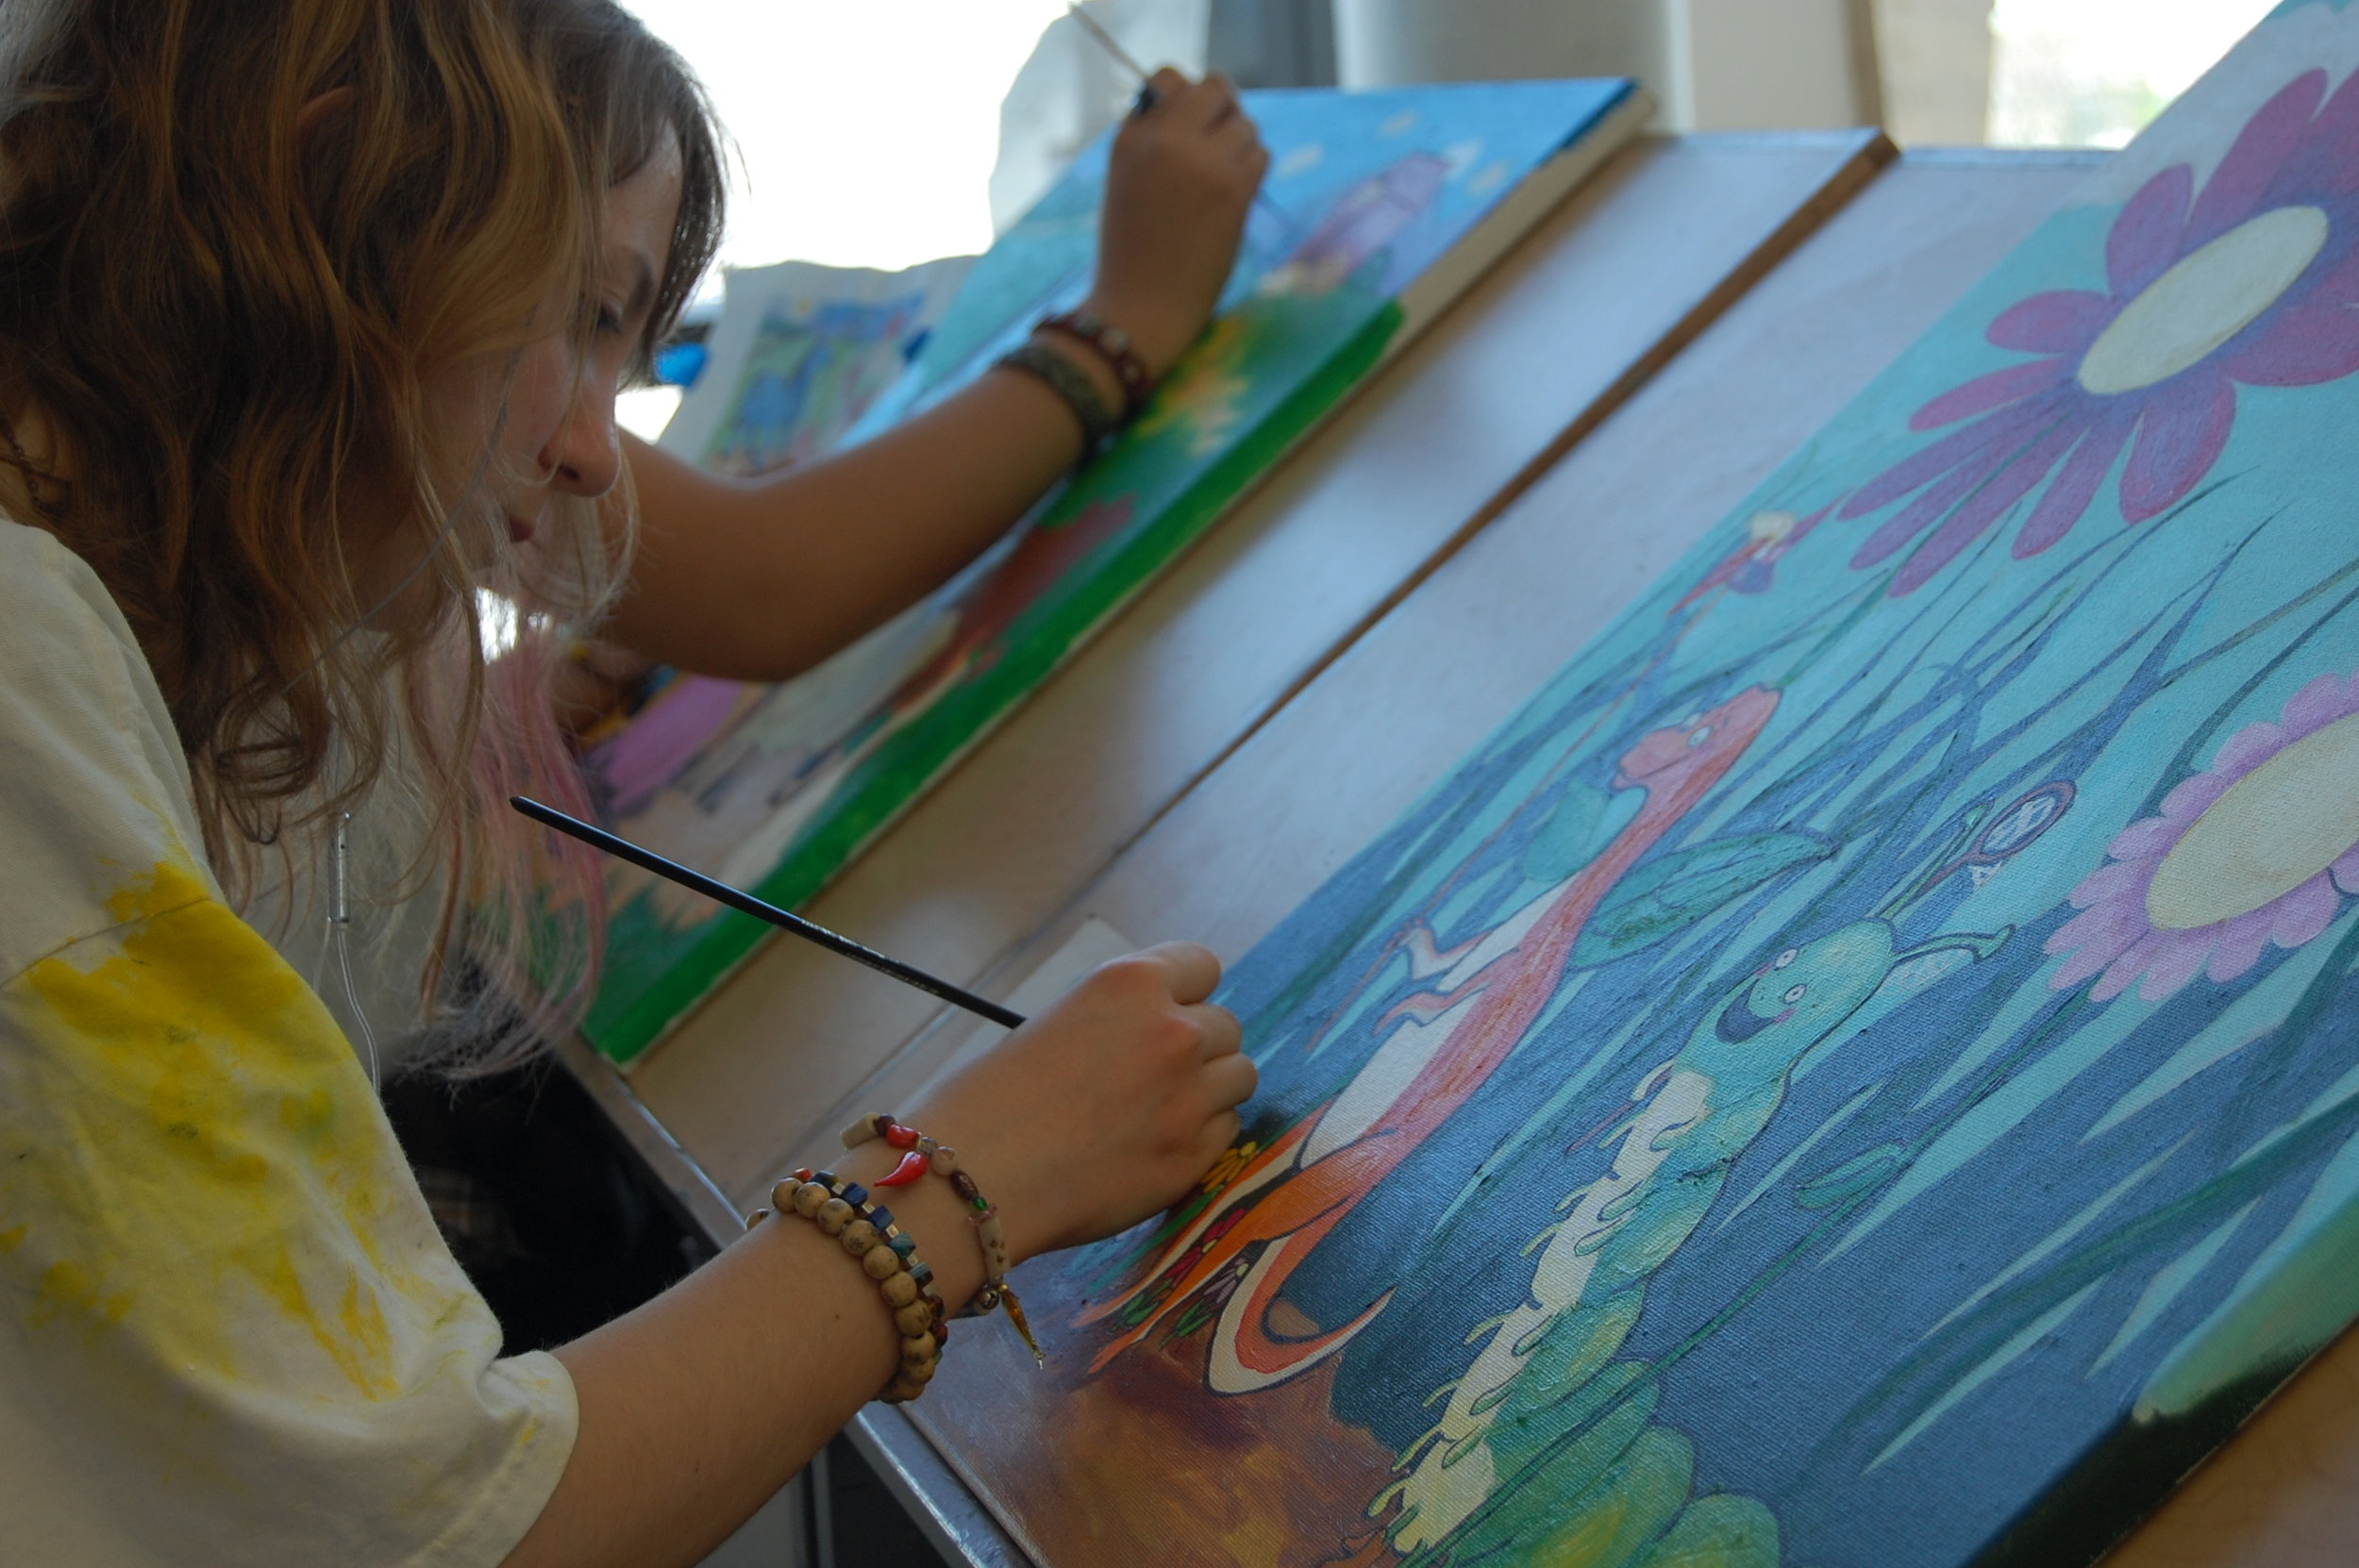 Arielle painting1.JPG